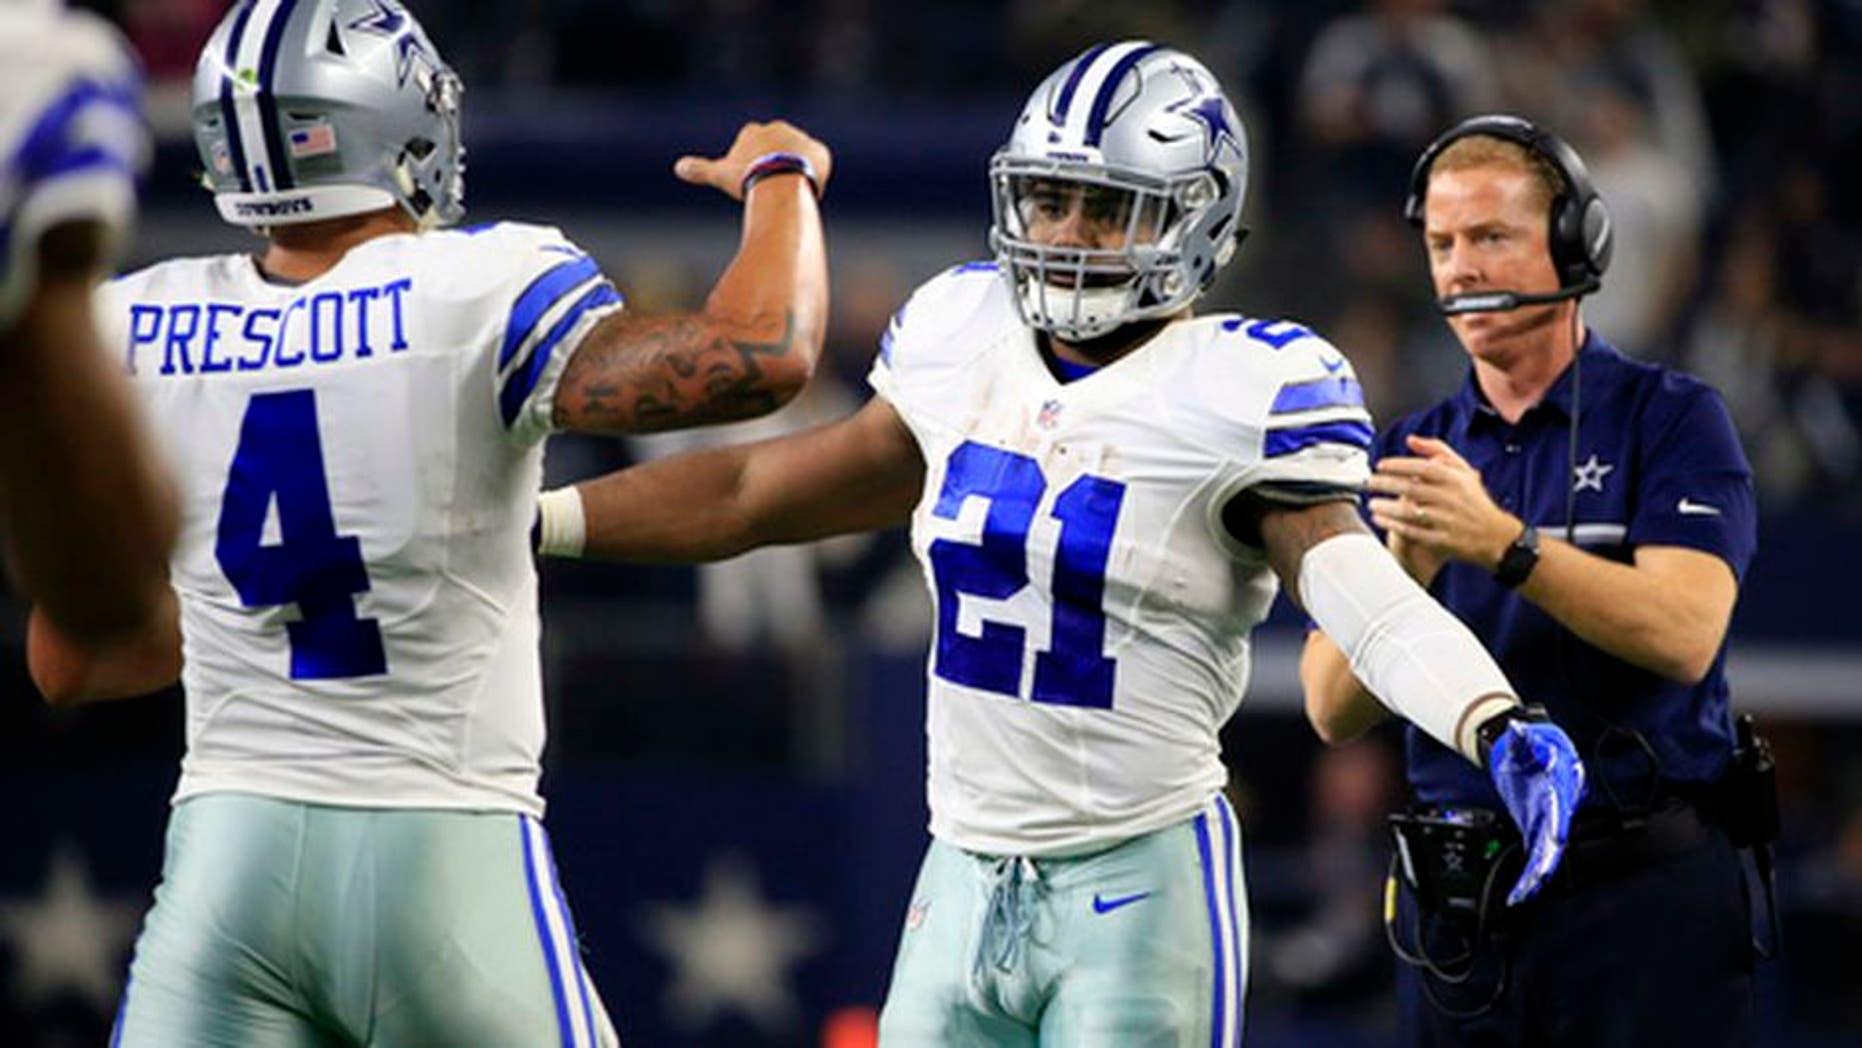 Dallas Cowboys' Dak Prescott (4) is congratulated on his touchdown run by Ezekiel Elliott (21) in the first half of an NFL football game against the Tampa Bay Buccaneers as head coach Jason Garrett, right, watches, , Sunday, Dec. 18, 2016, in Arlington, Texas. (AP Photo/Ron Jenkins)